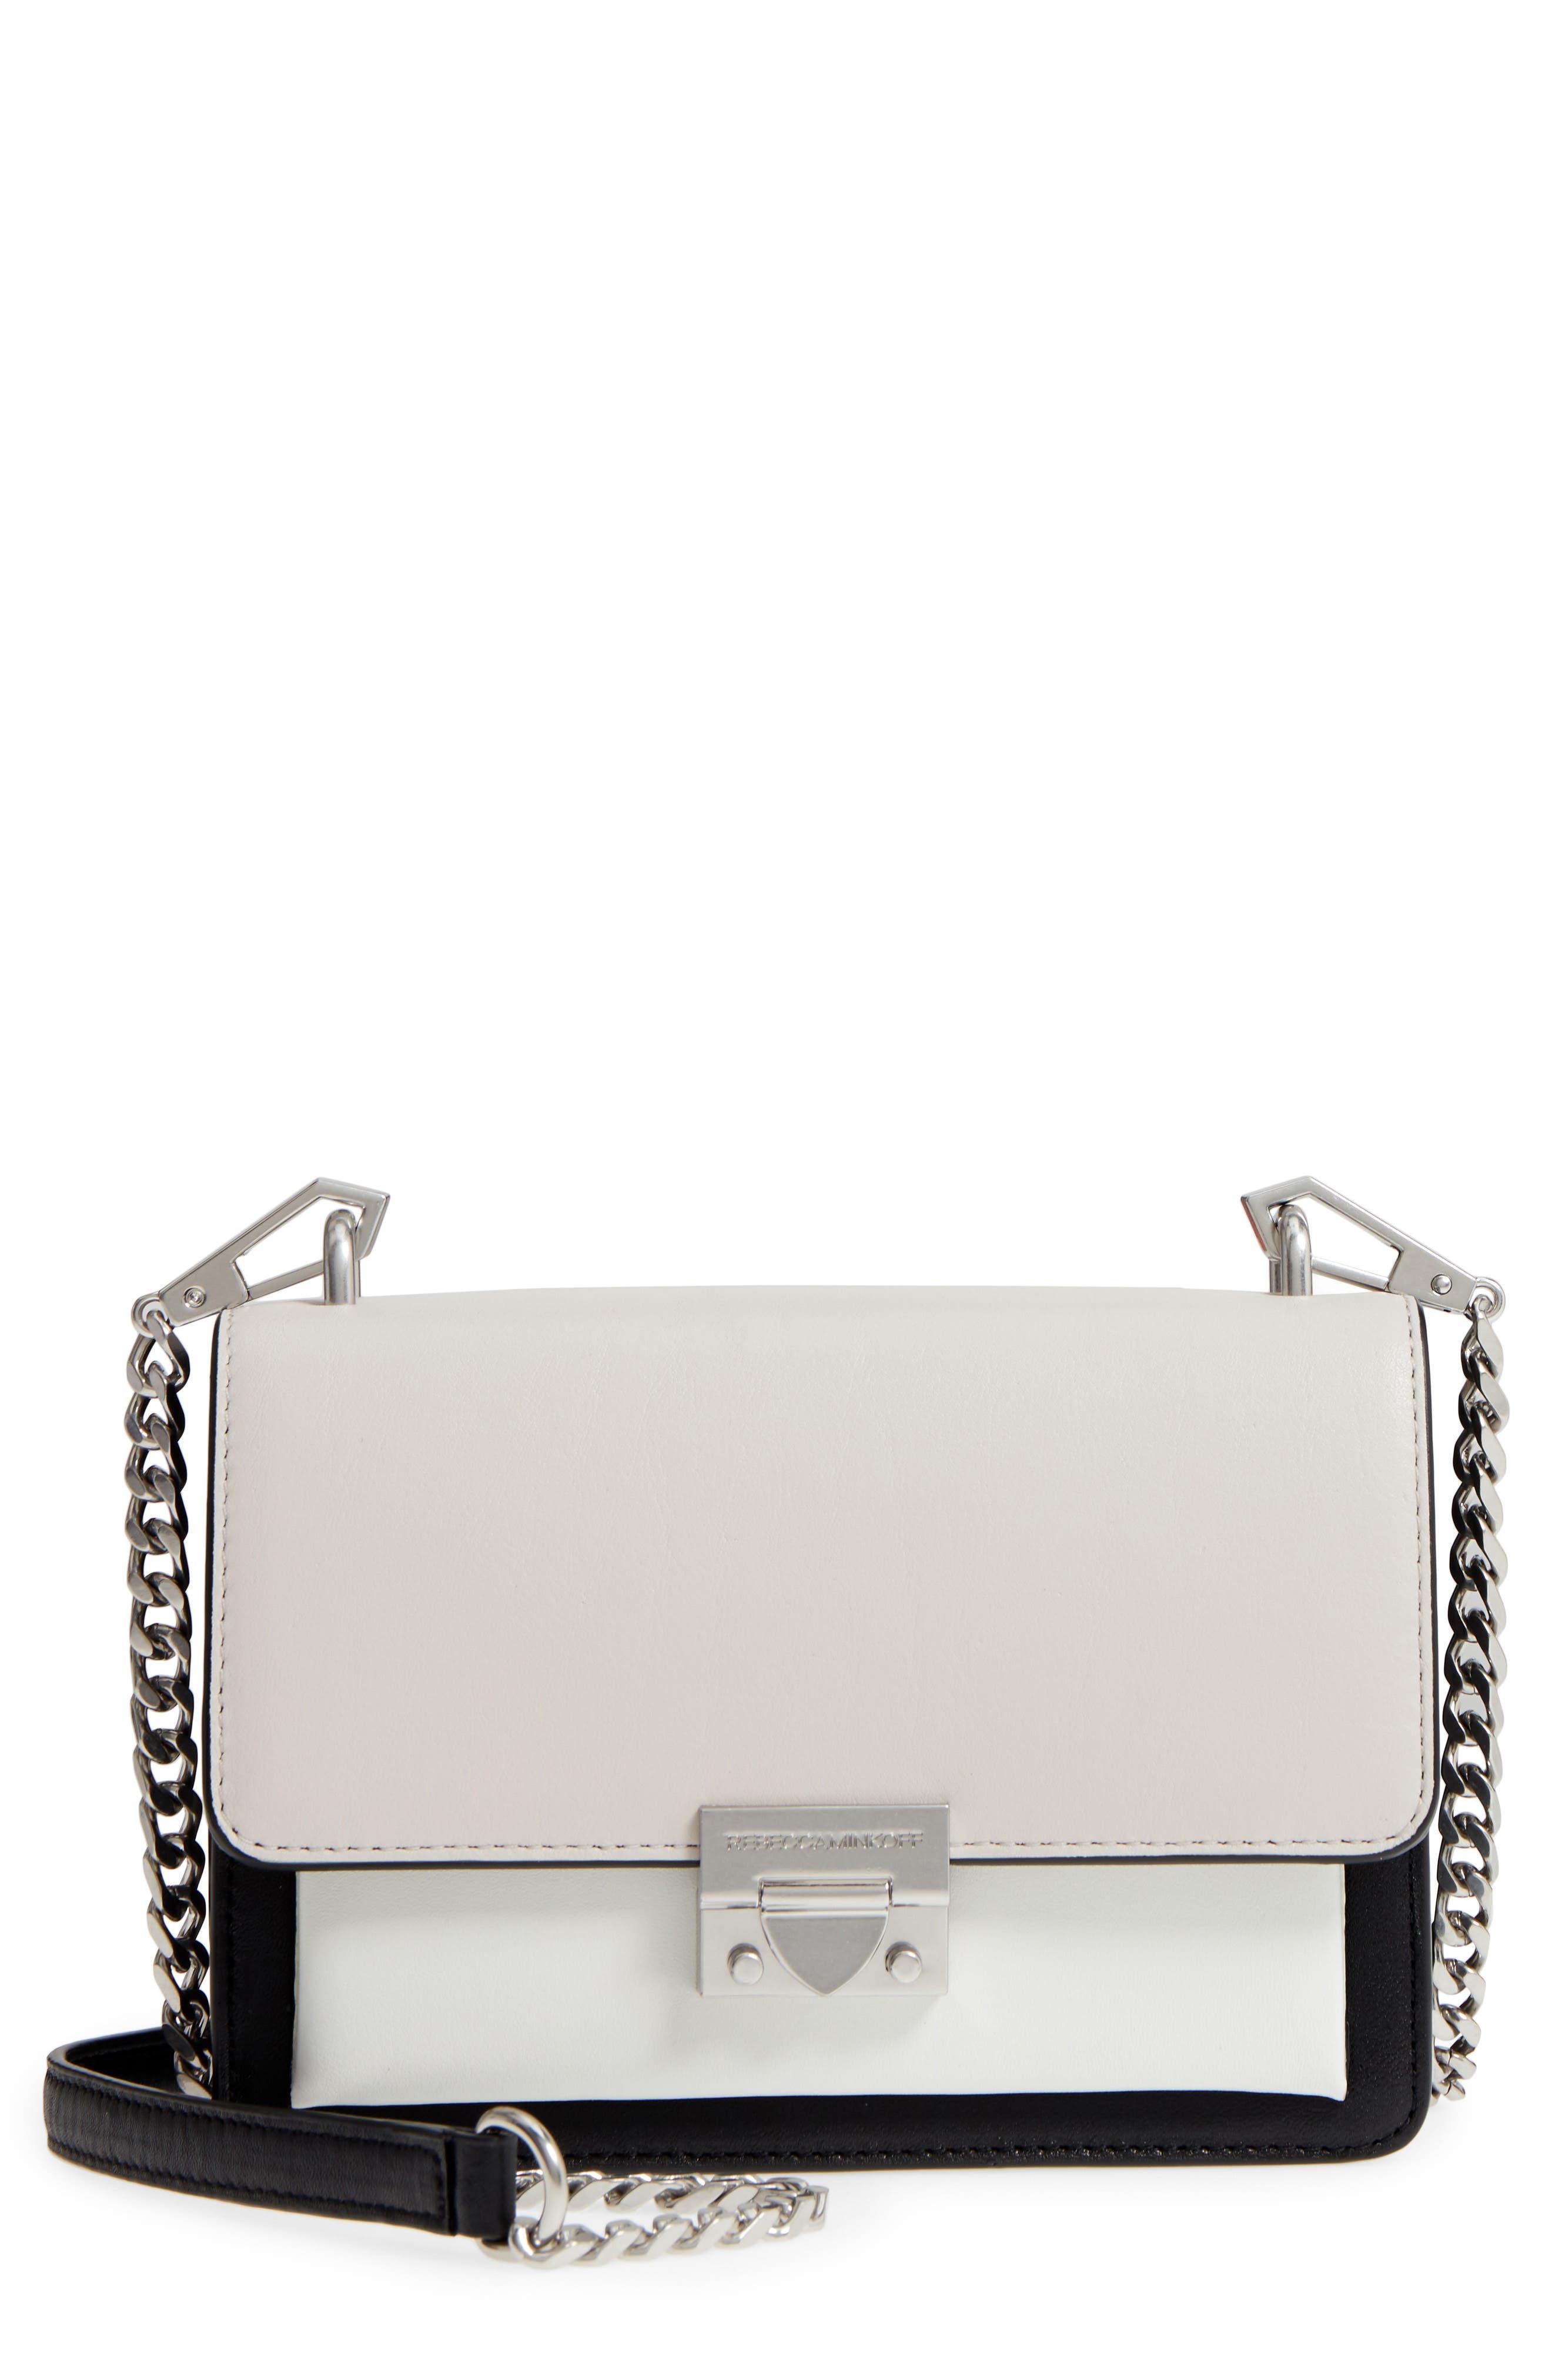 Rebecca Minkoff Small Christy Leather Shoulder Bag